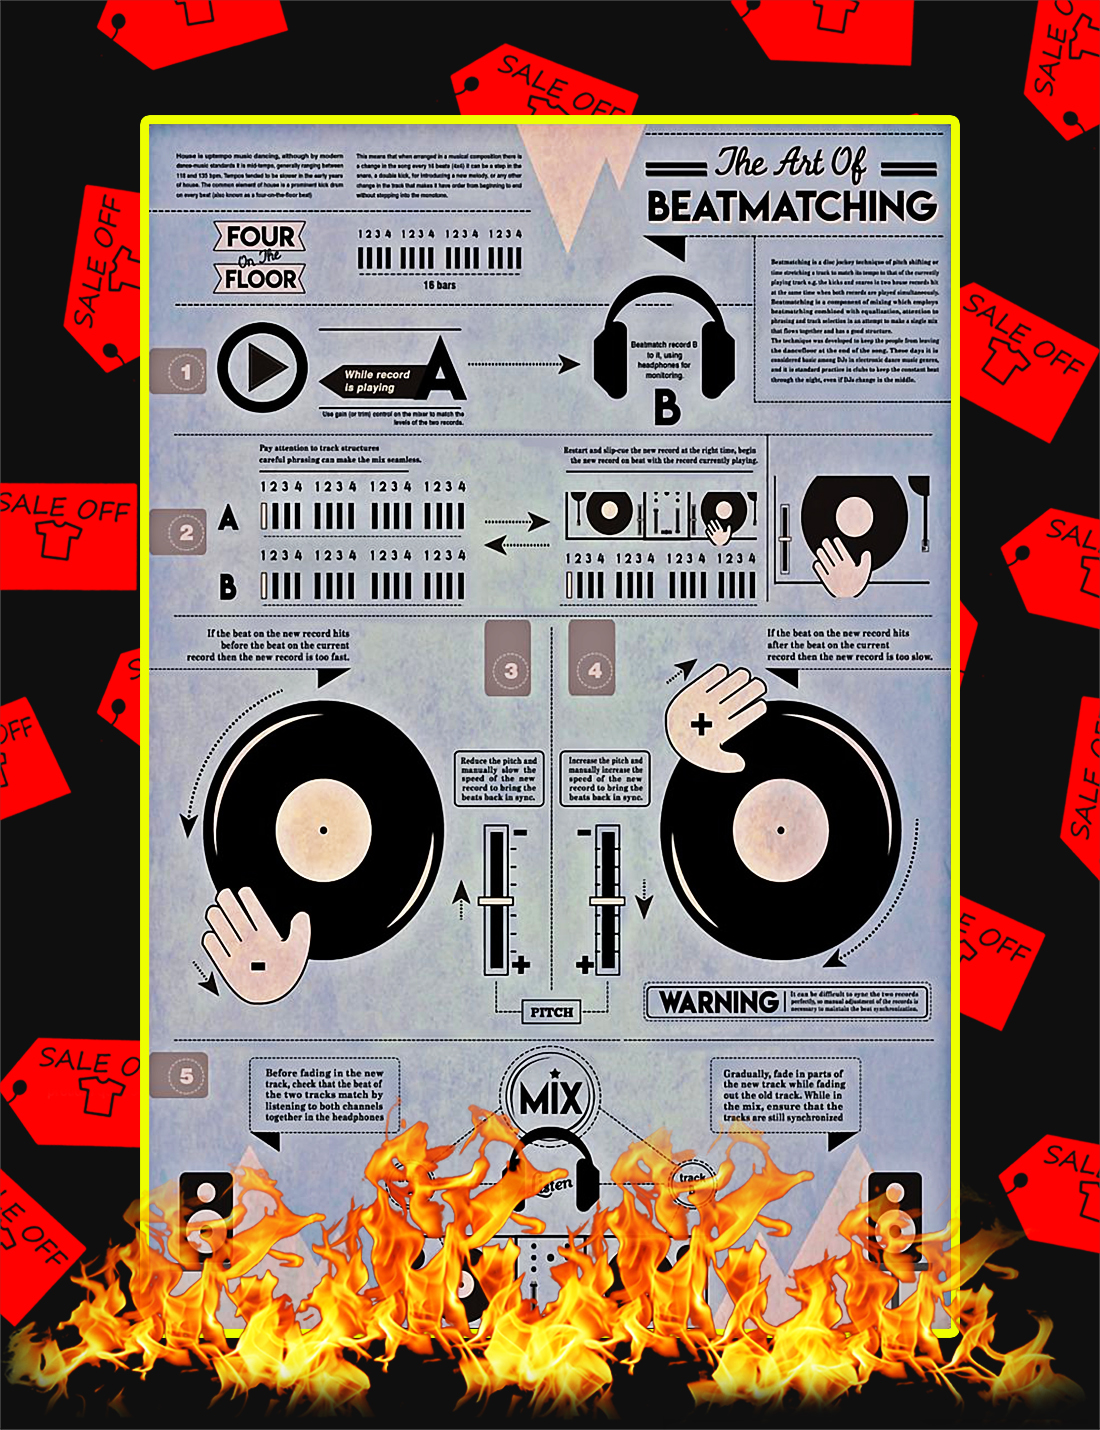 The Art Of Beatmatching Poster - 11x17